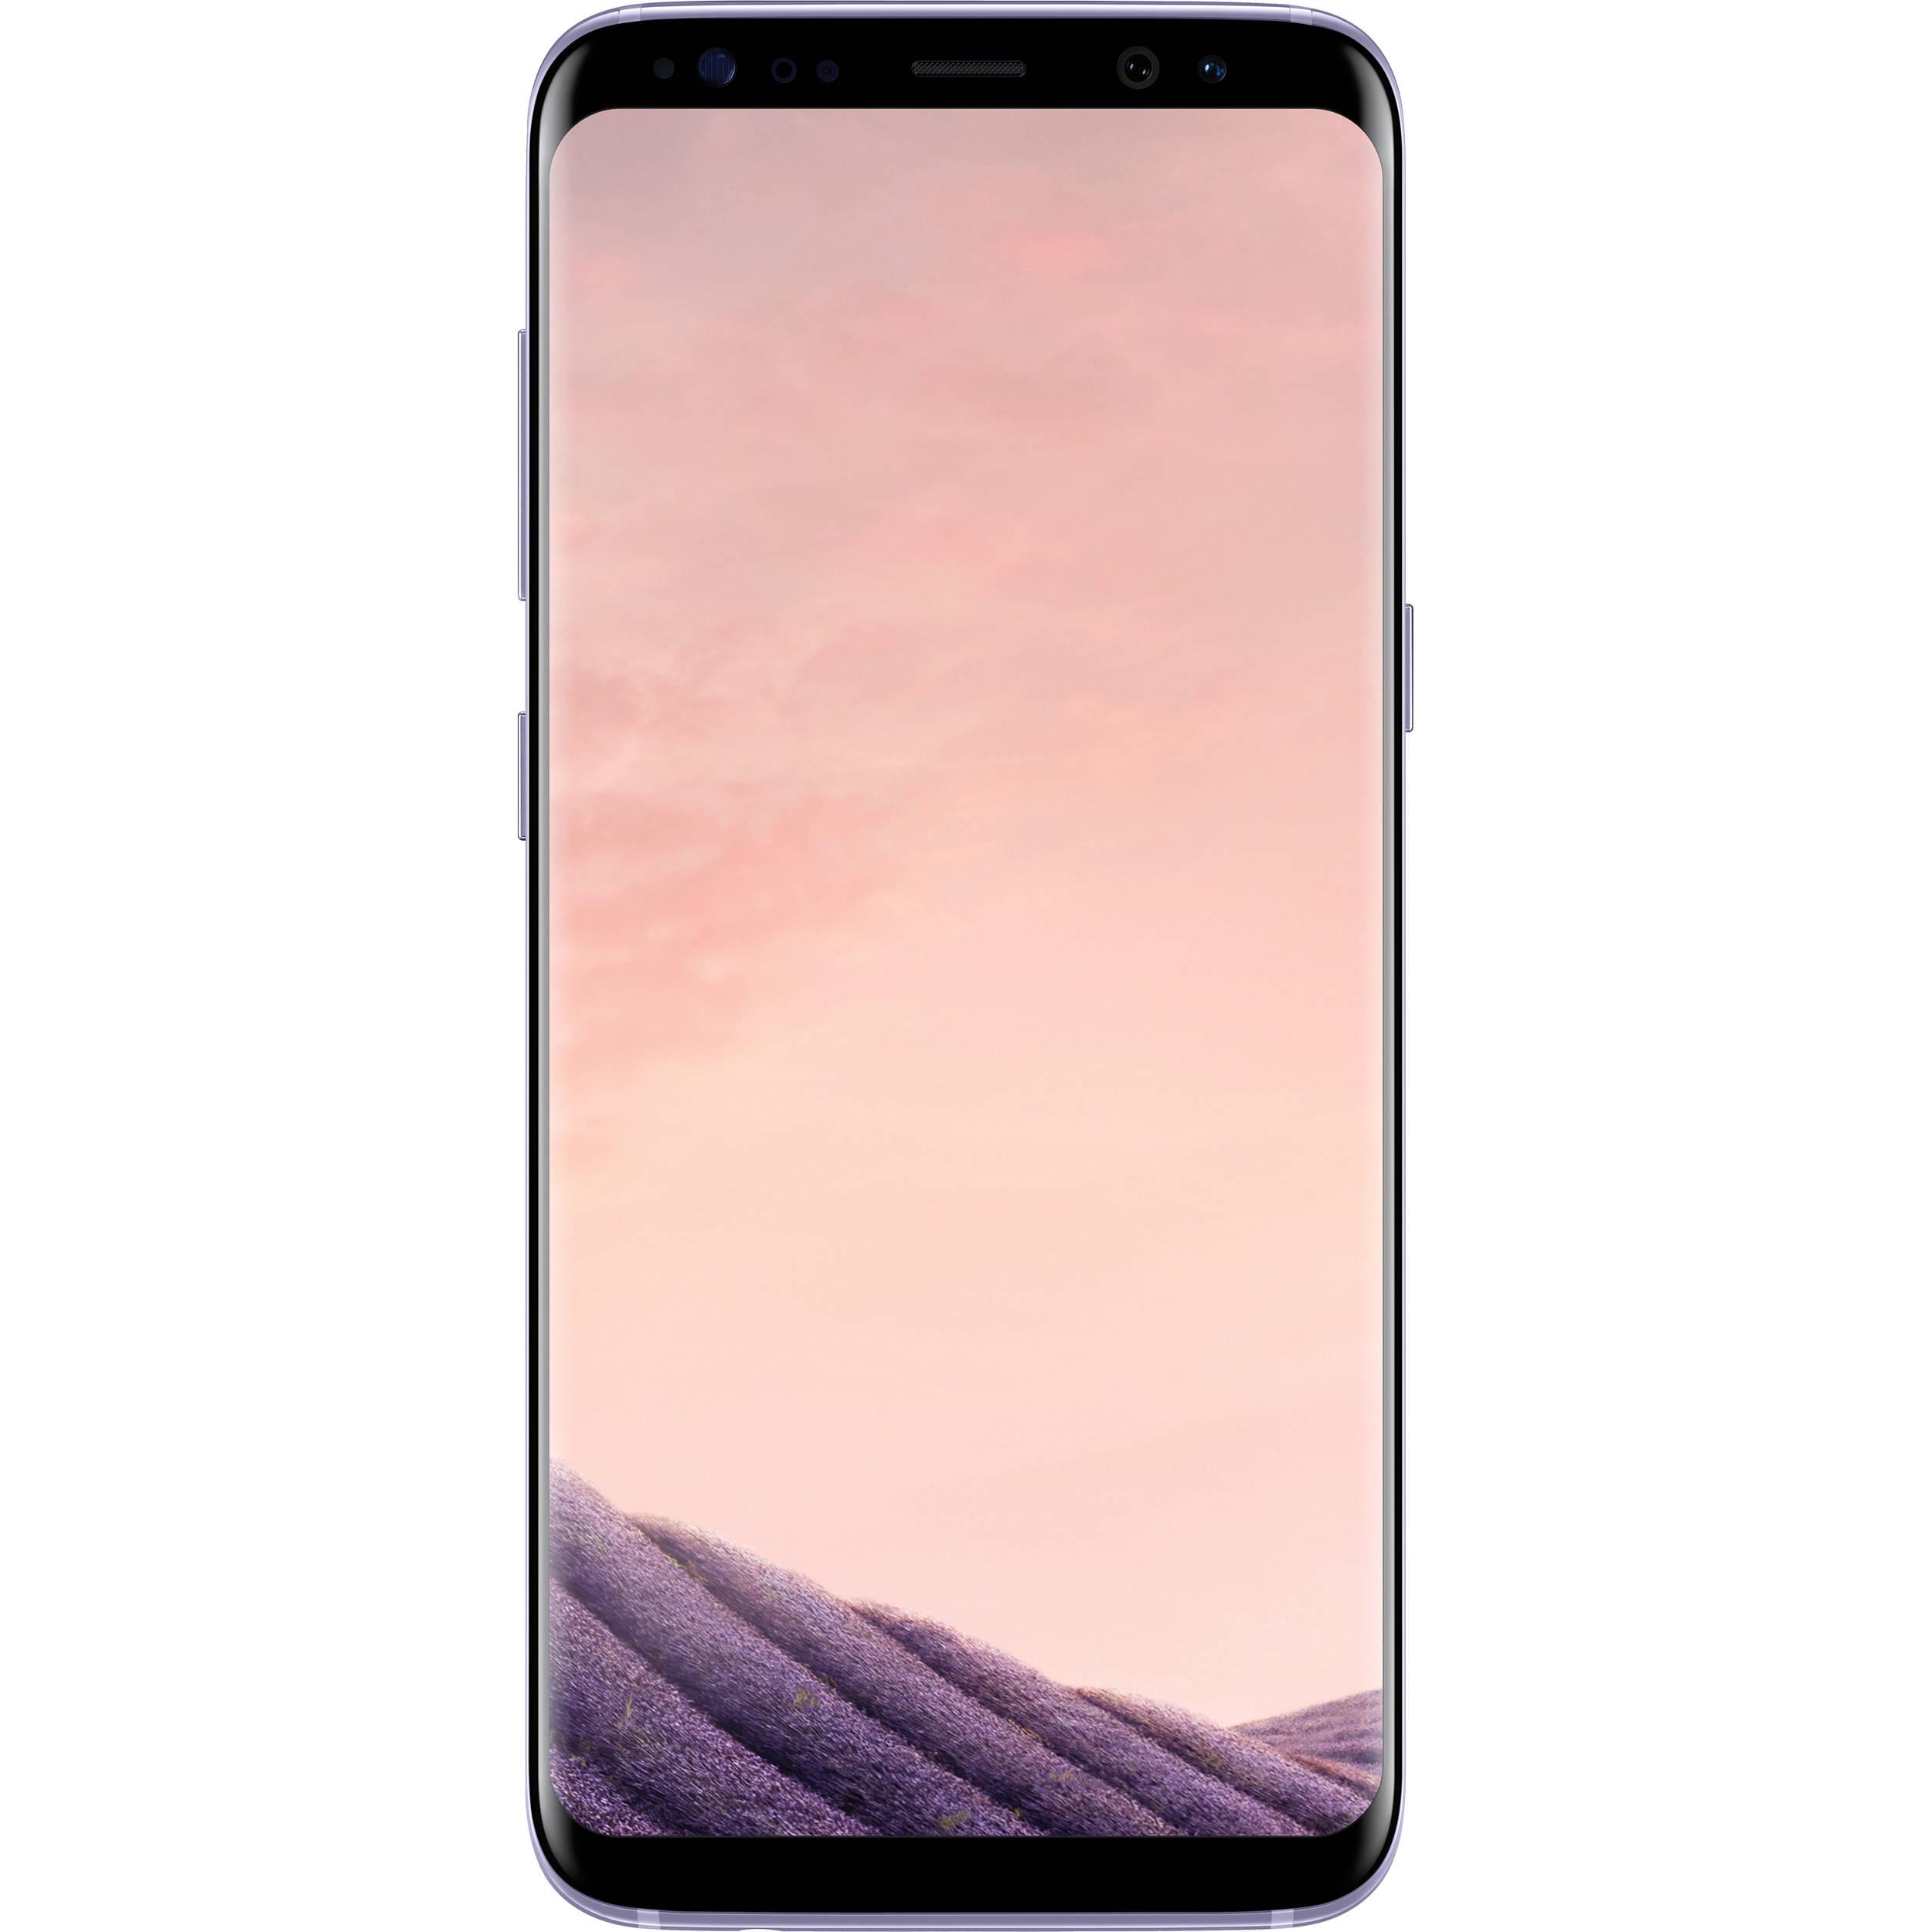 Samsung Galaxy S8 Duos SM-G950FD 64GB Smartphone (Unlocked, Orchid Gray)